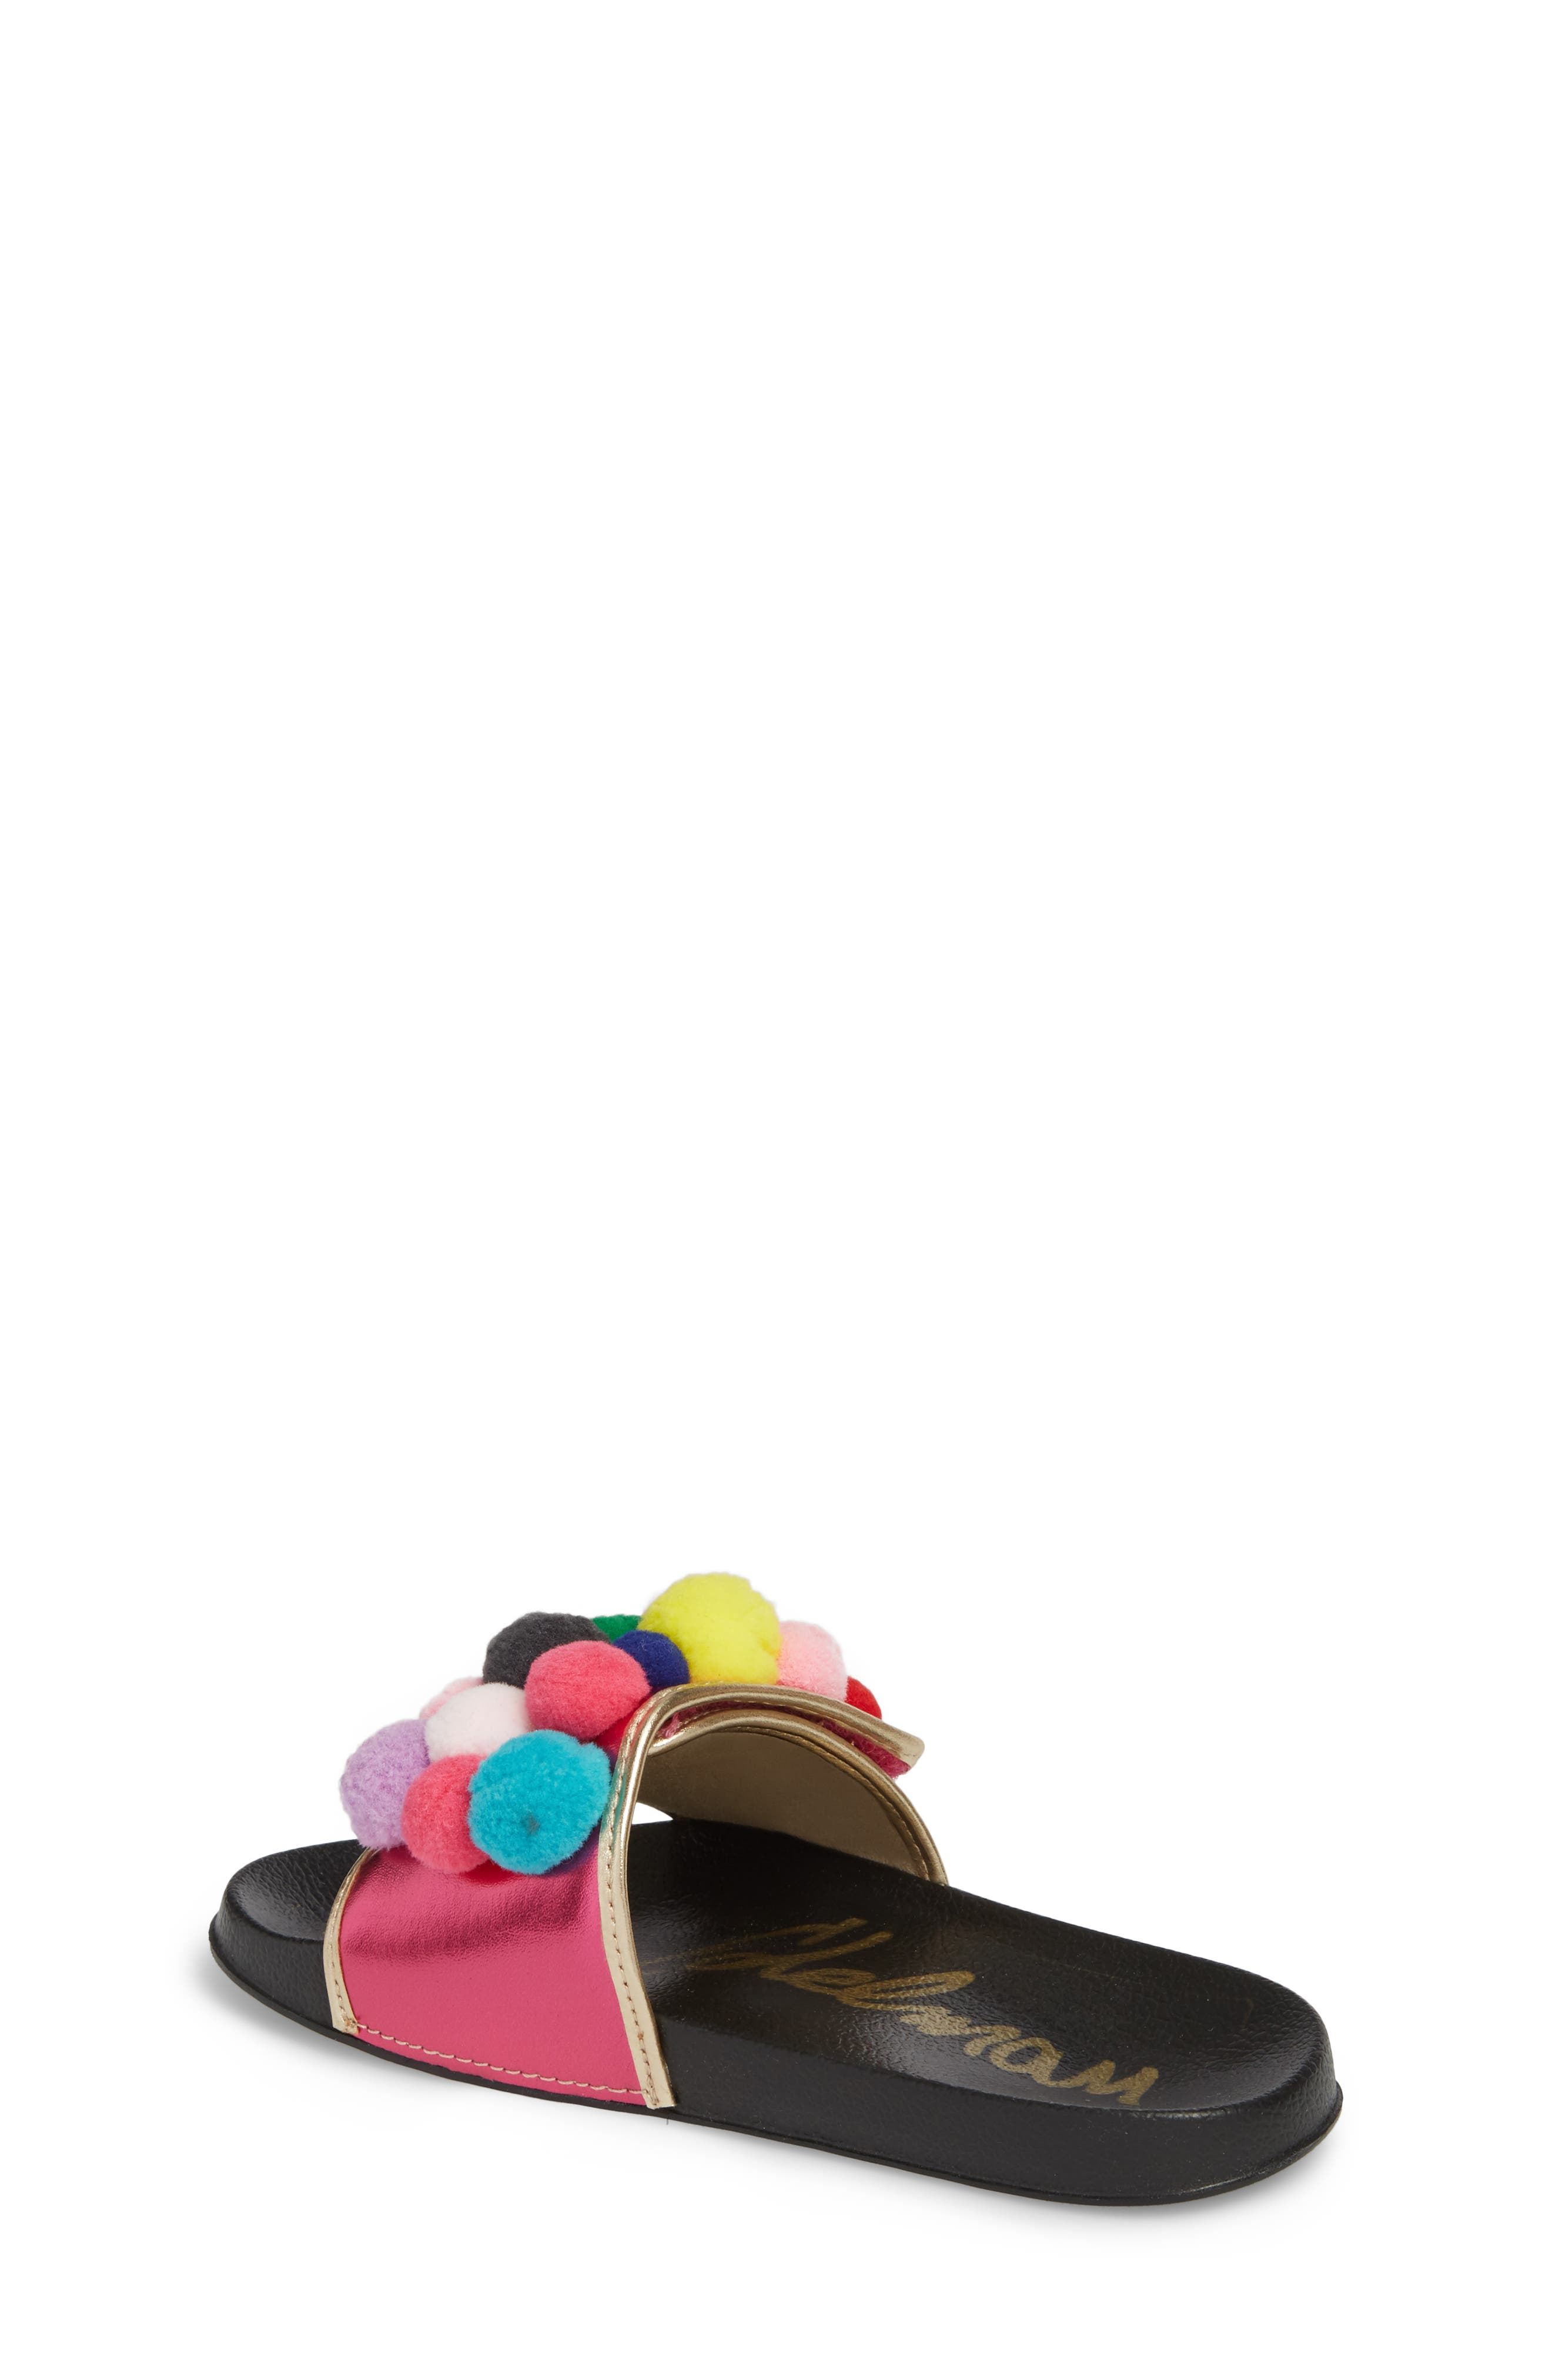 Faux Fur Mackie Cayman Sandal,                             Alternate thumbnail 2, color,                             Hot Pink Multi